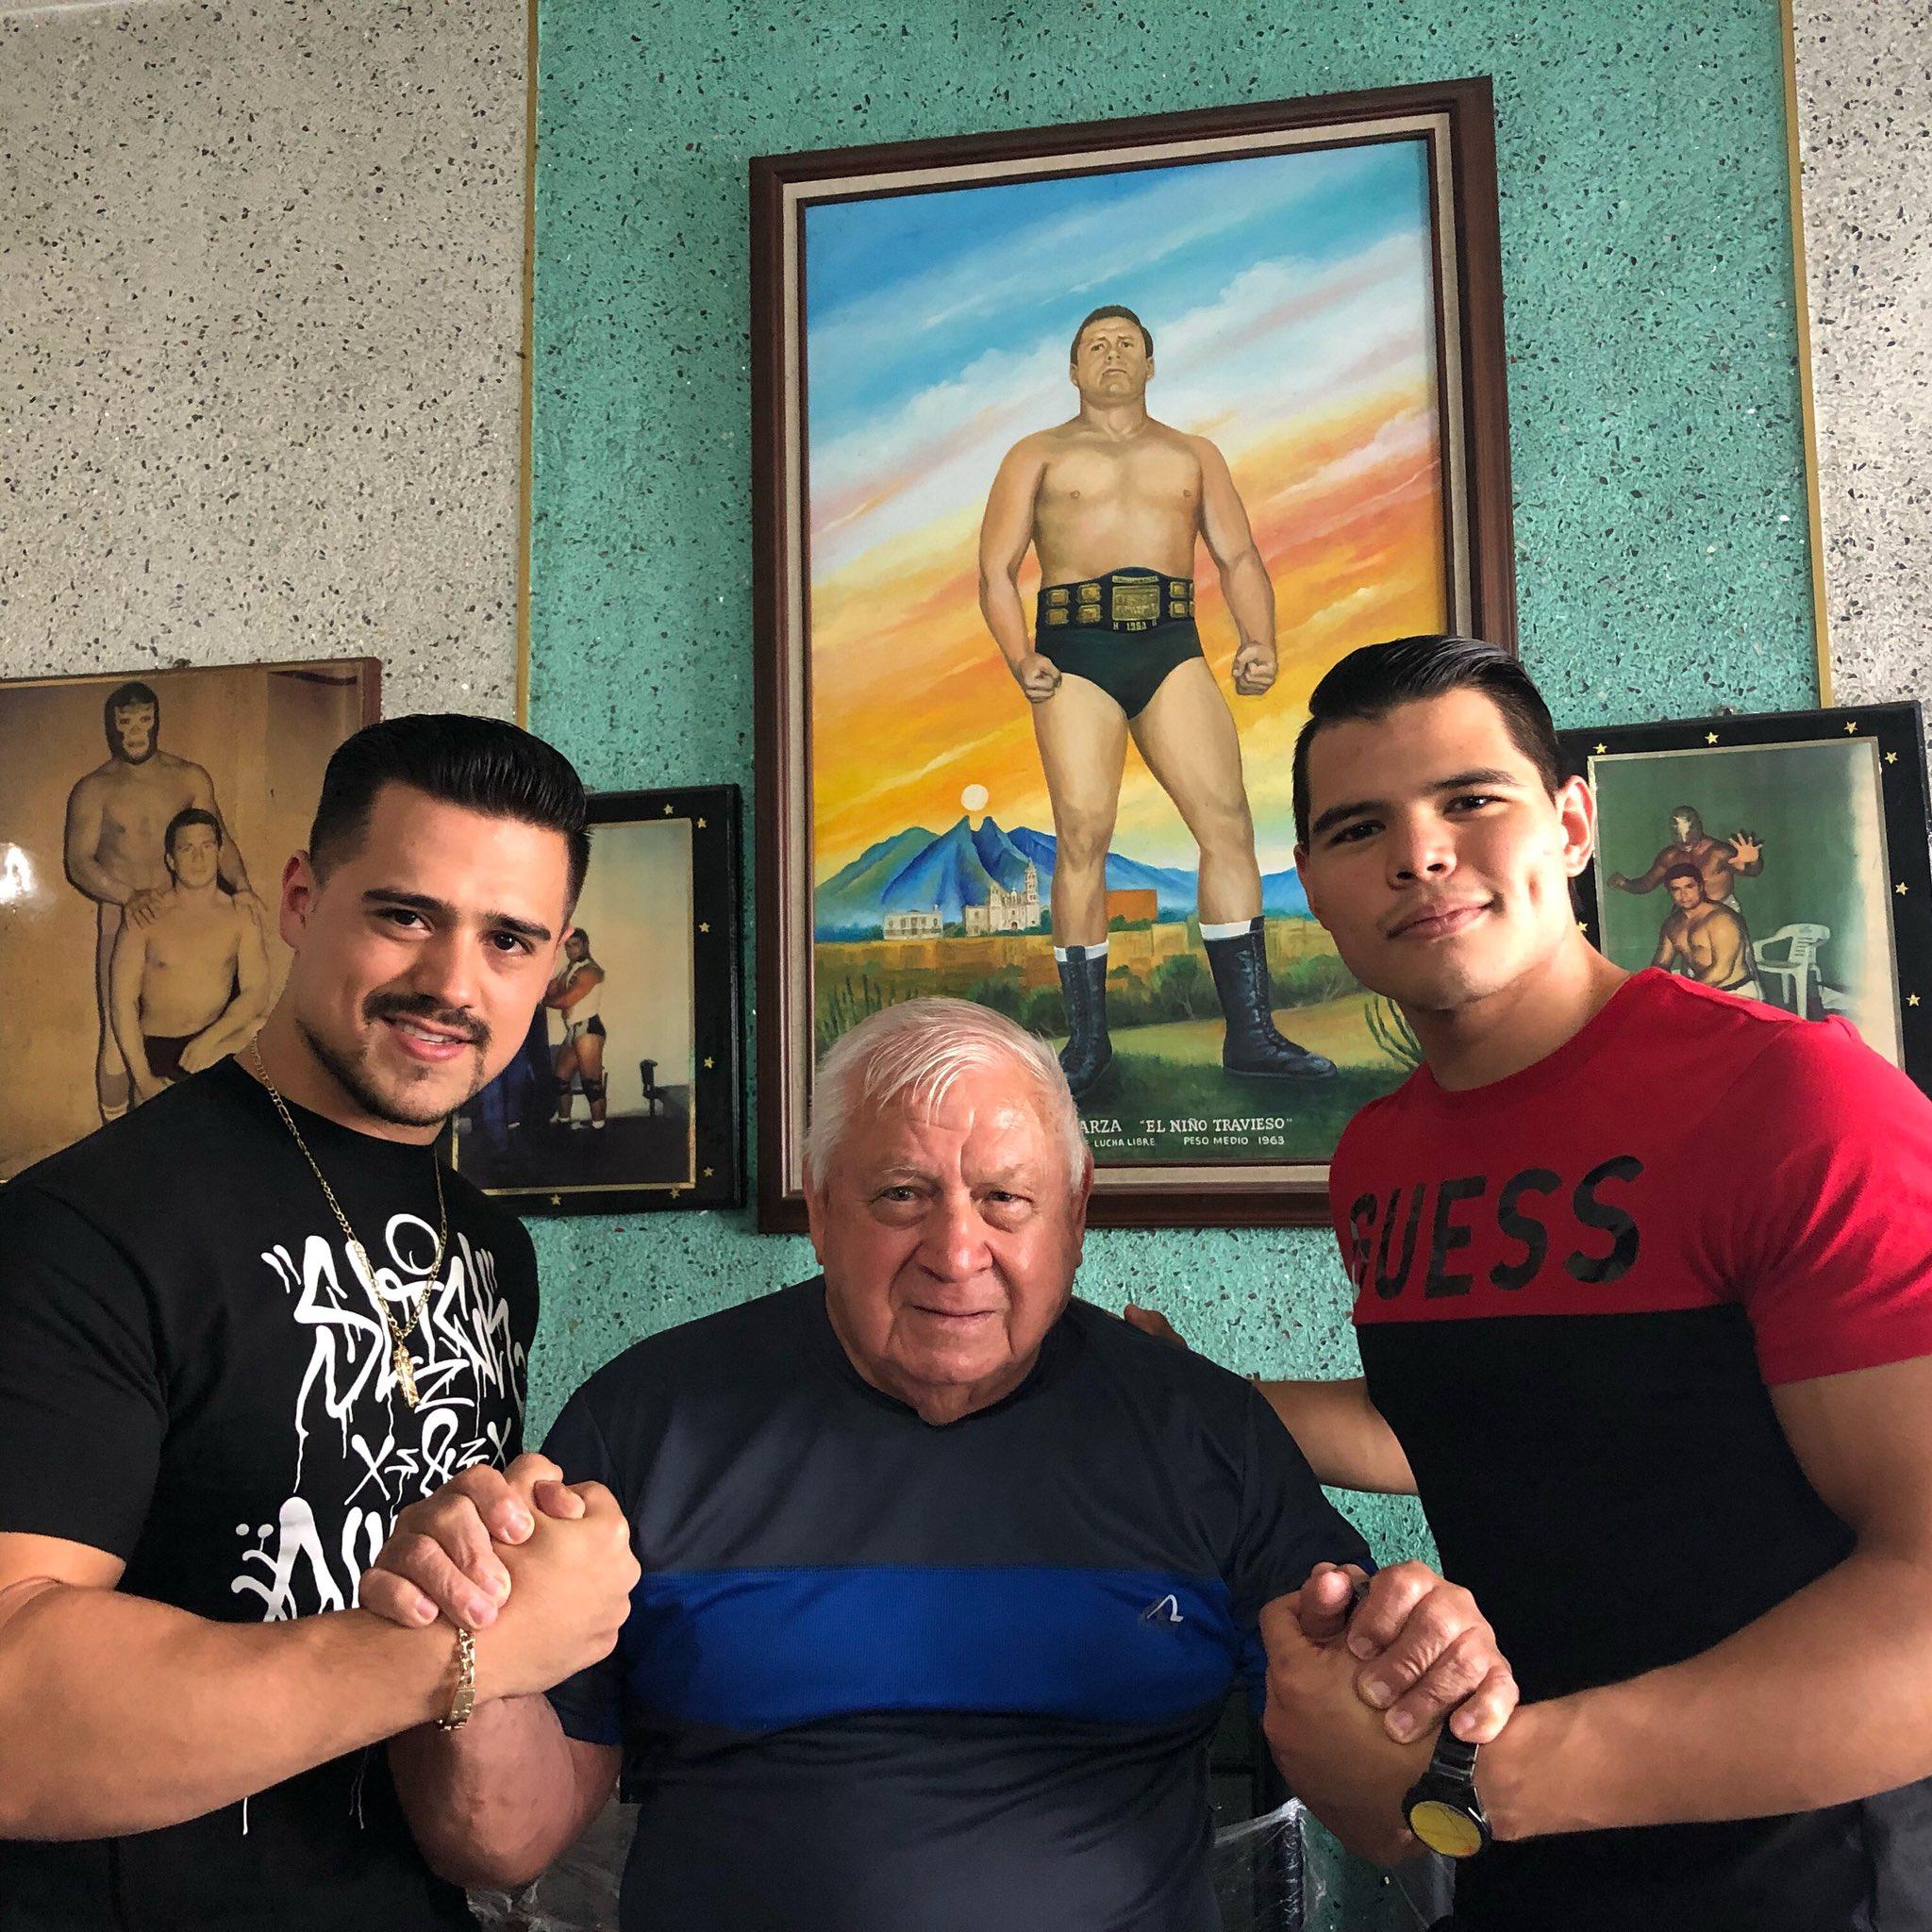 Ángel Garza vs Humberto Carrillo añadida a Super ShowDown 2020 – Superluchas